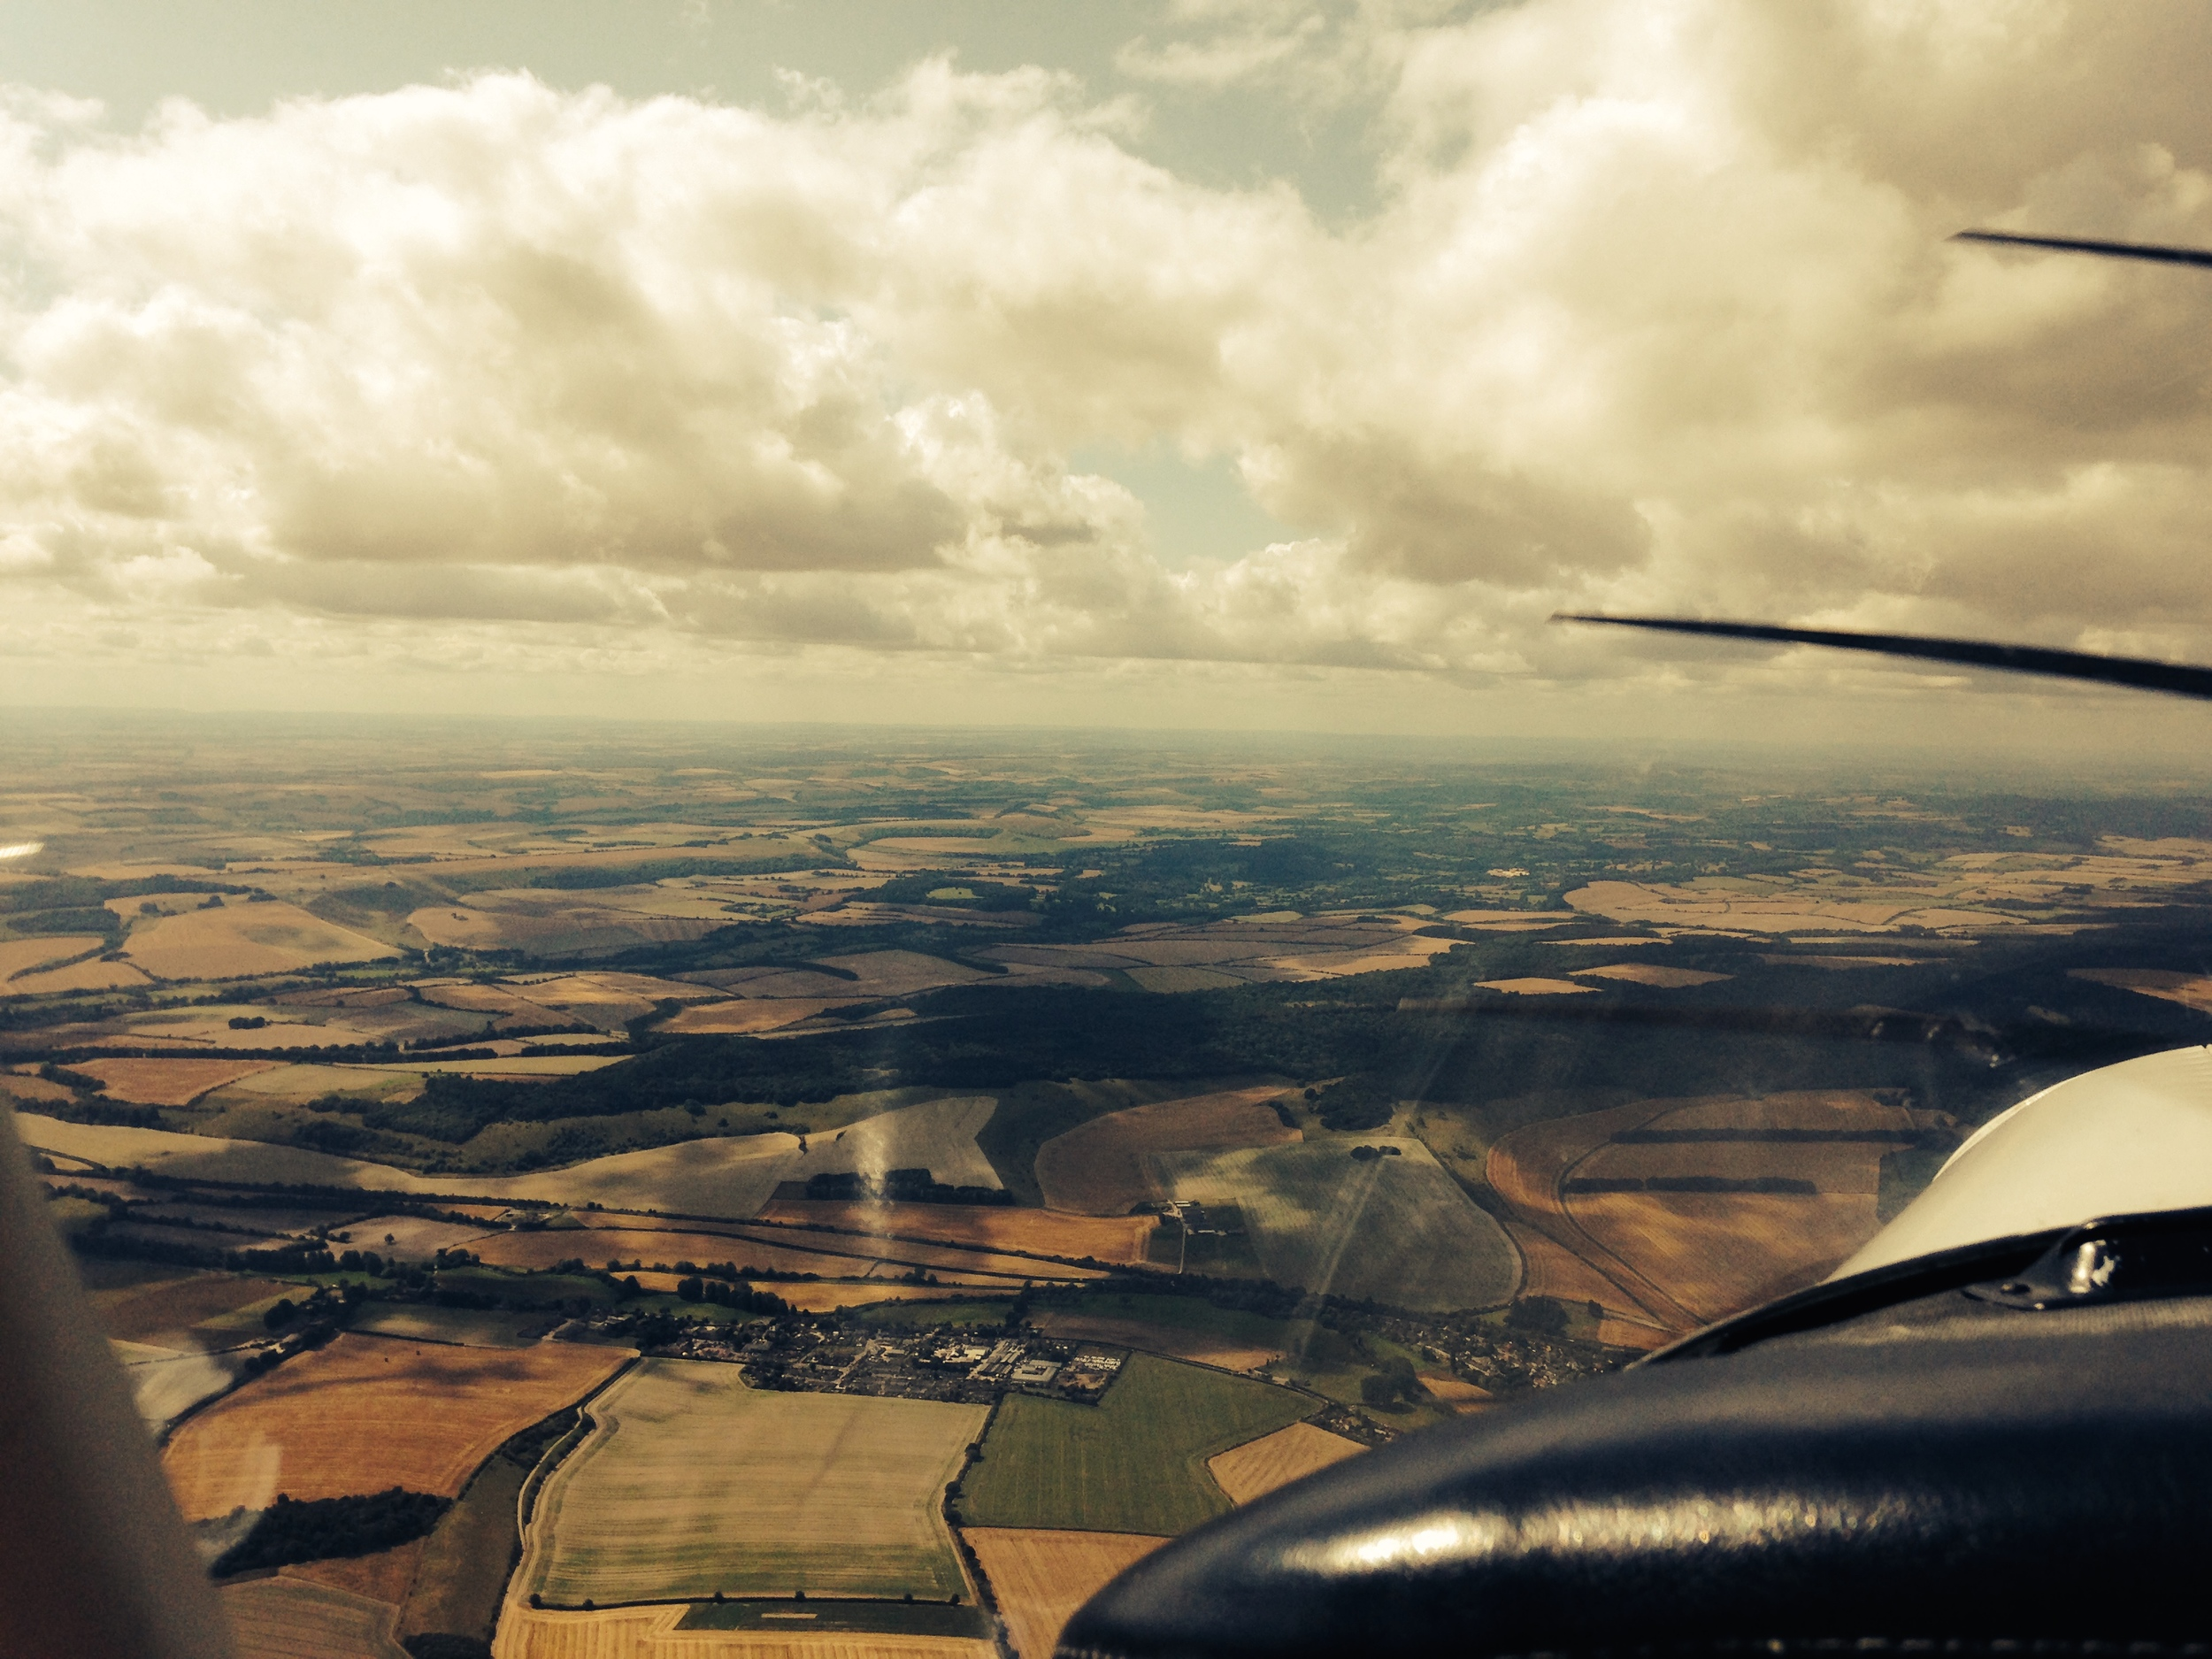 Flying lesson at London Elstree Aerodrome...